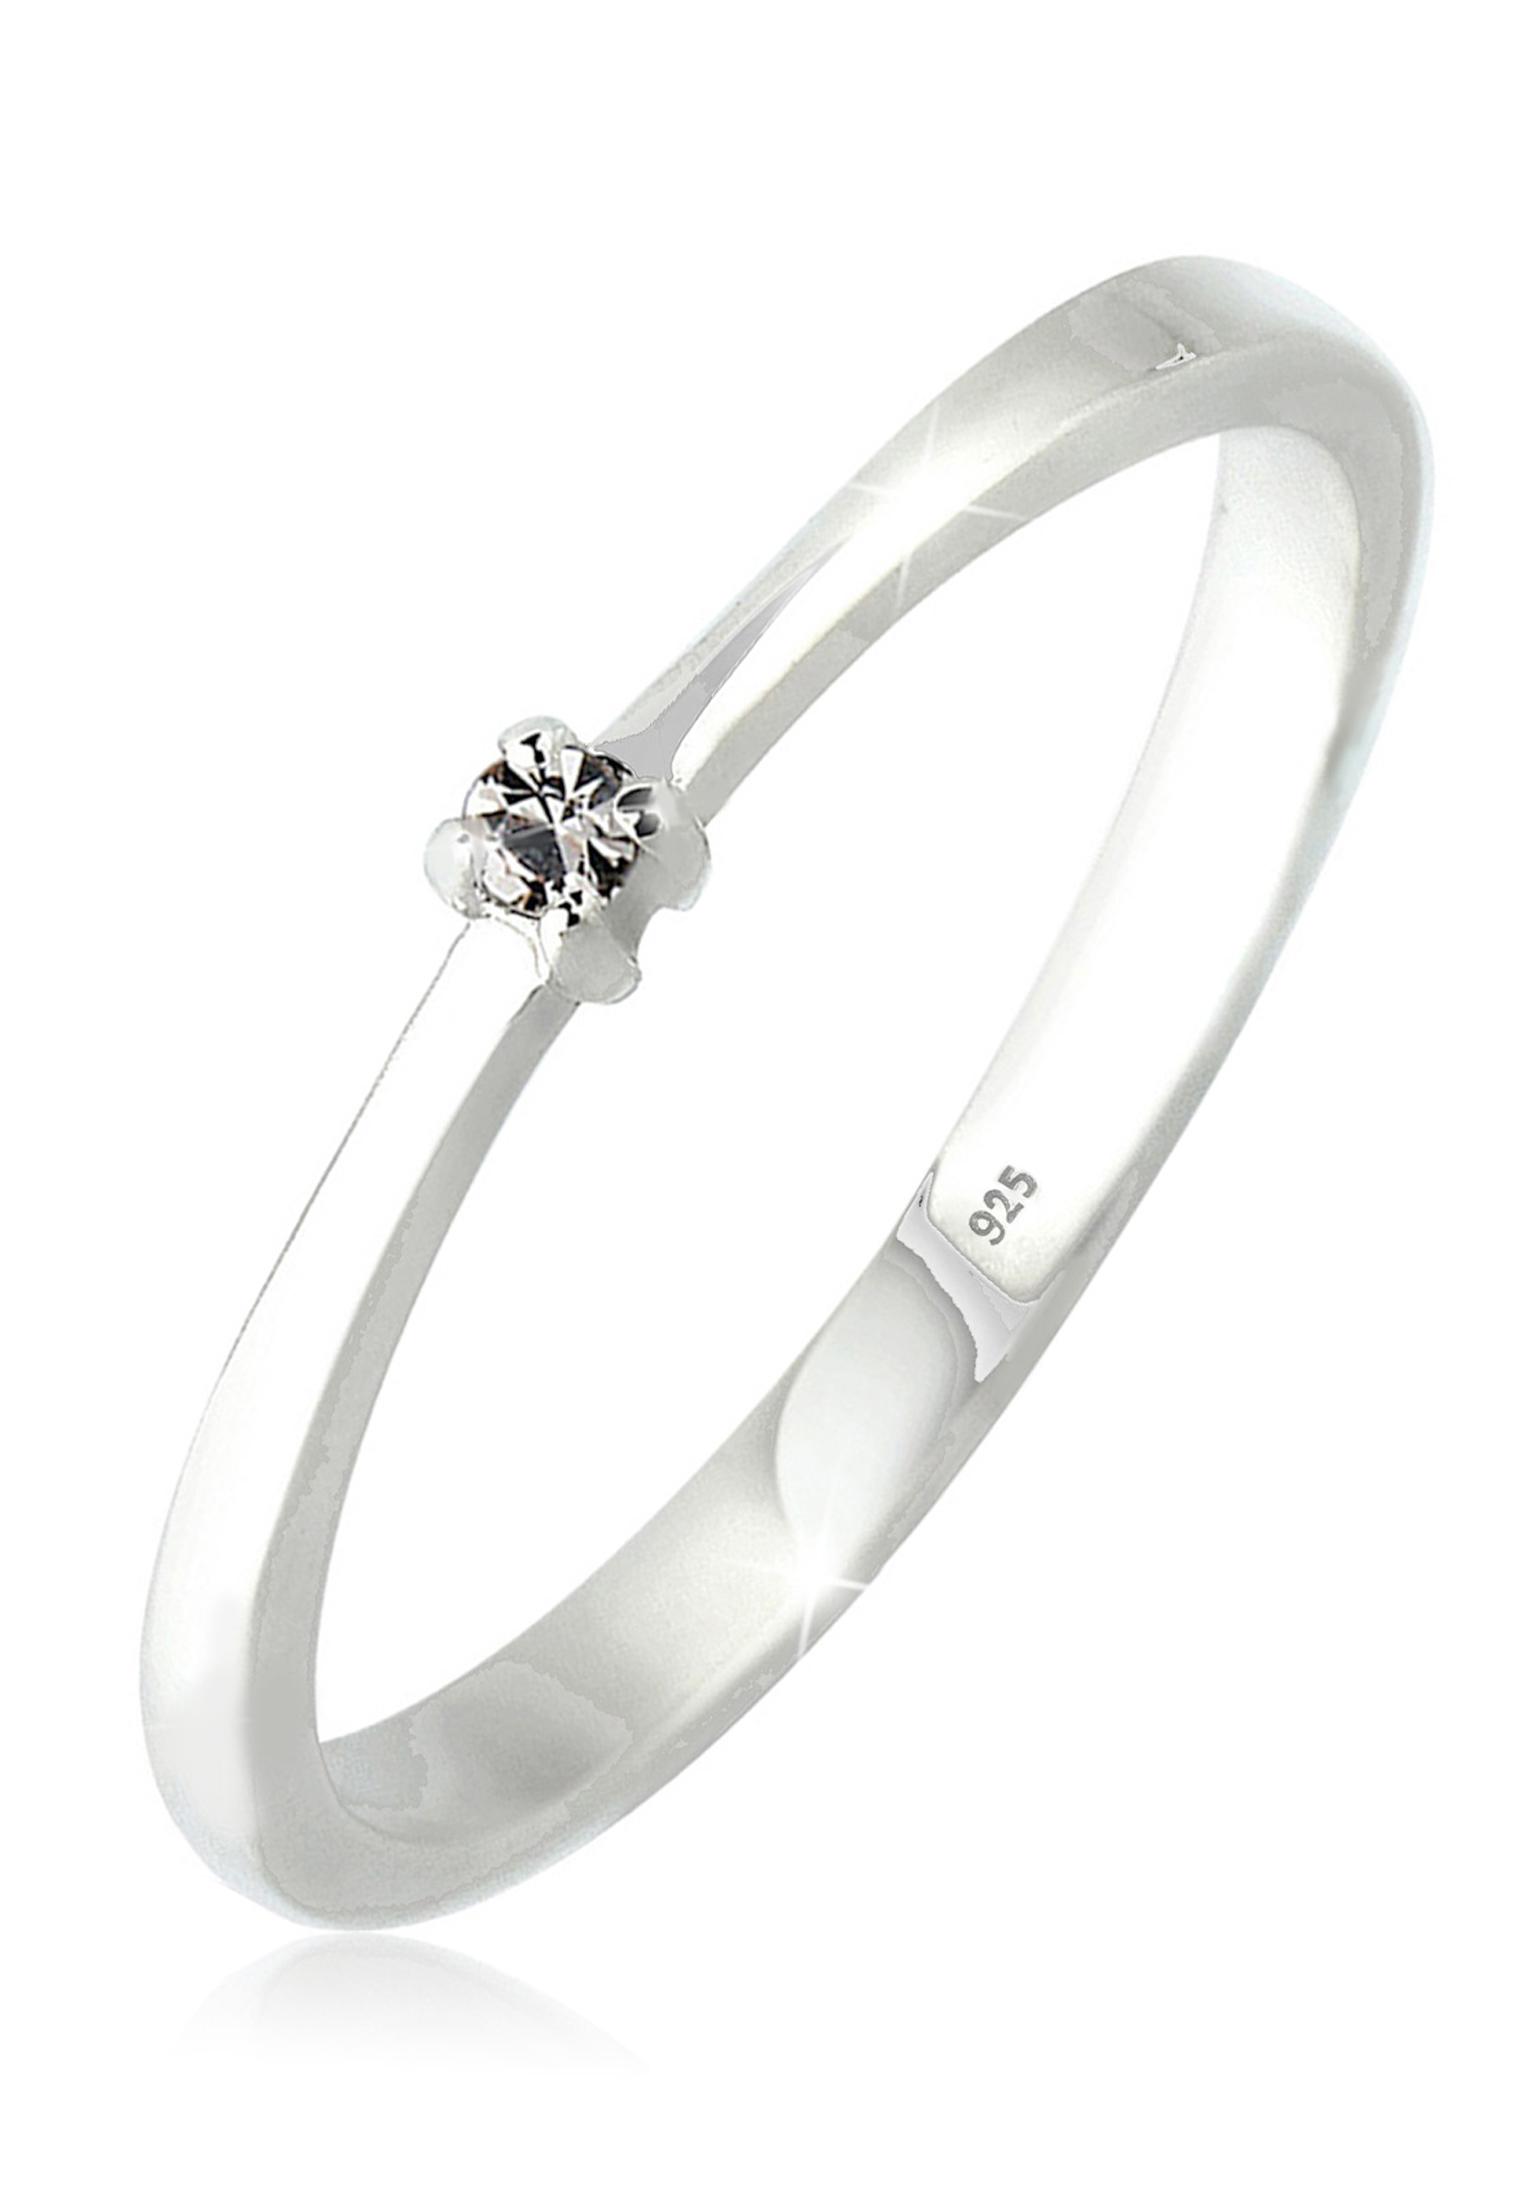 Solitär-Ring   Kristall ( Grau )   925er Sterling Silber